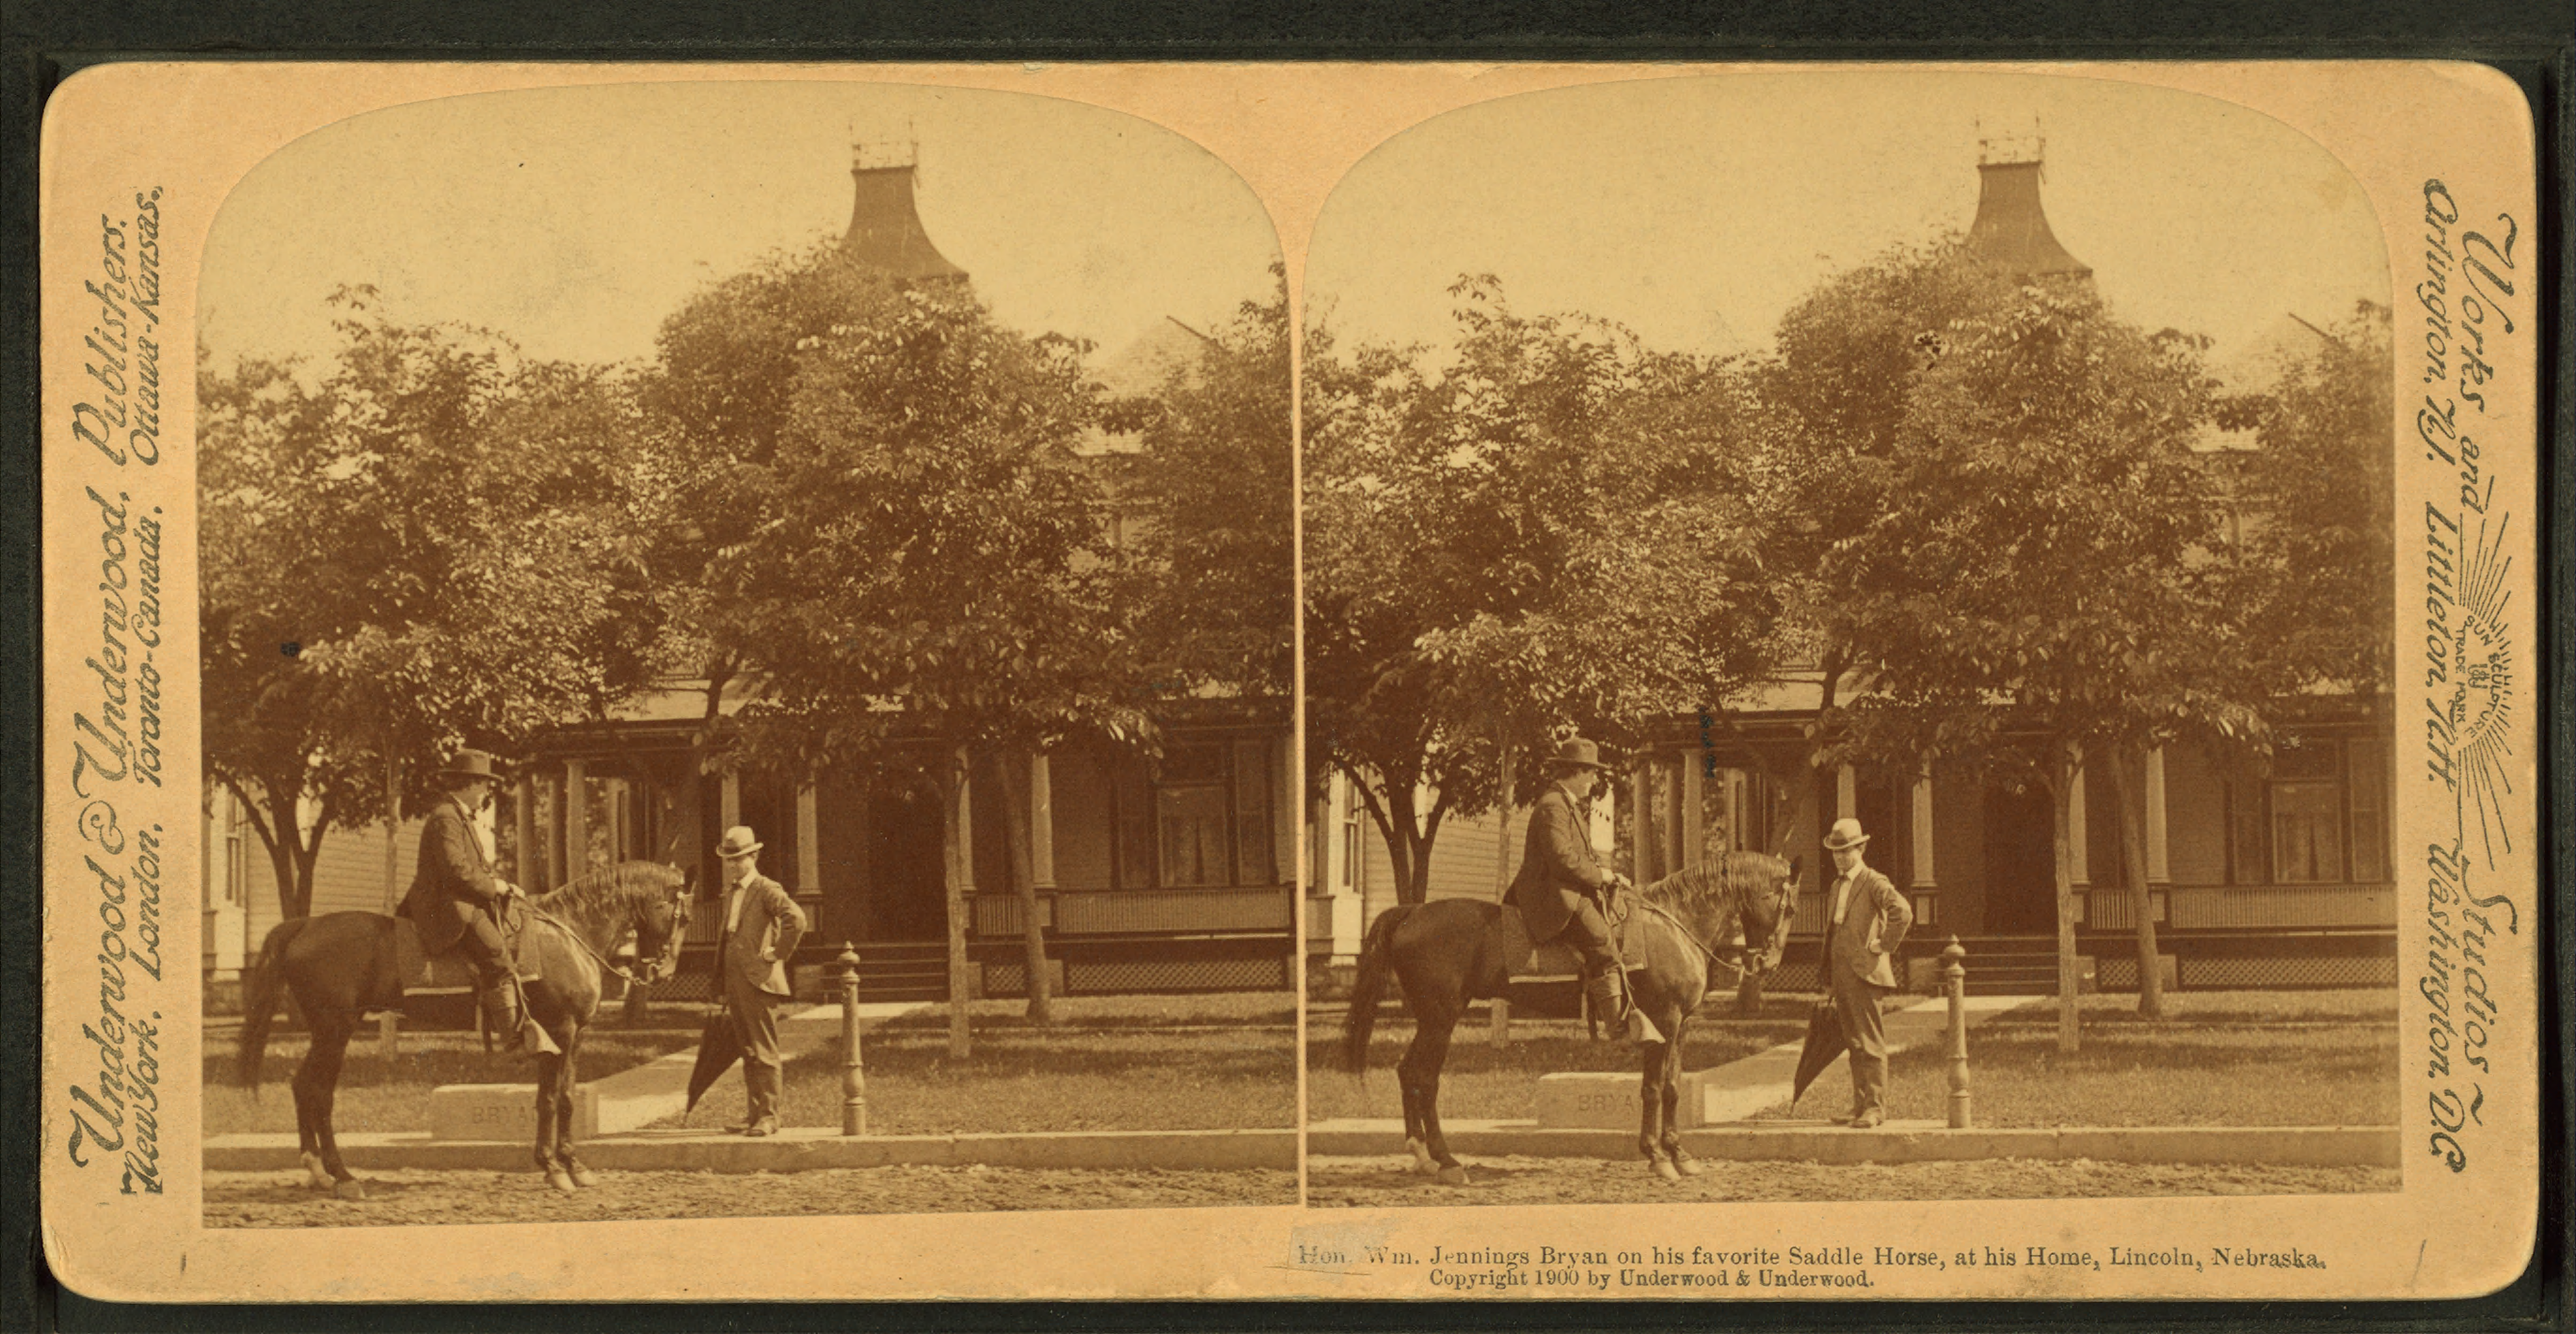 File:William Jennings Bryan on his favorite horse at his